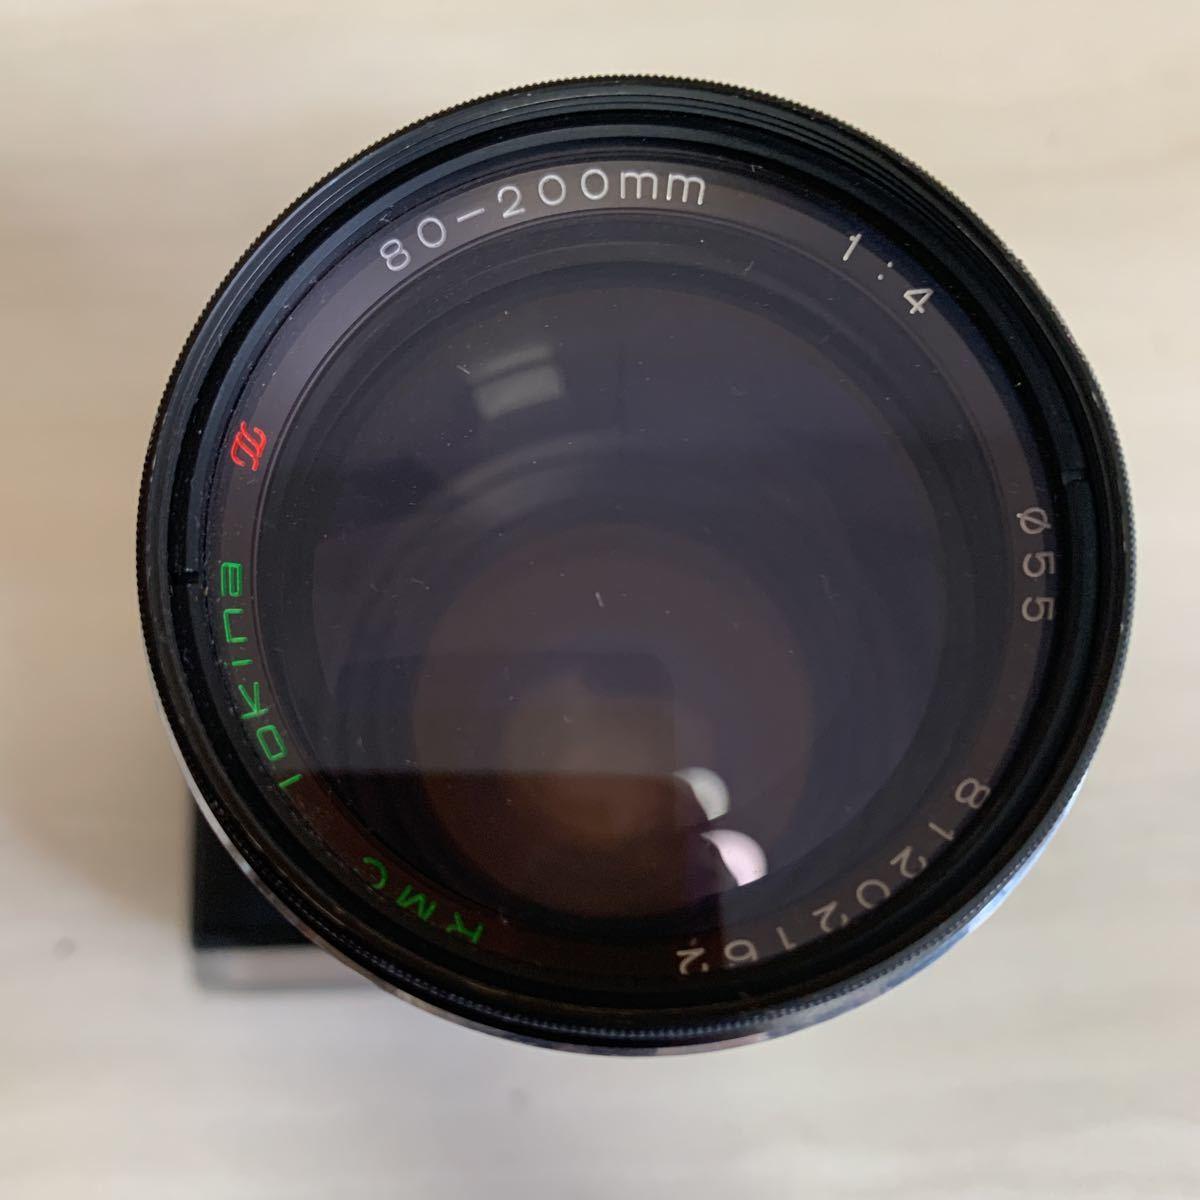 PENTAX ME F ペンタックス 一眼レフカメラ フィルムカメラ 未確認 2025_画像6